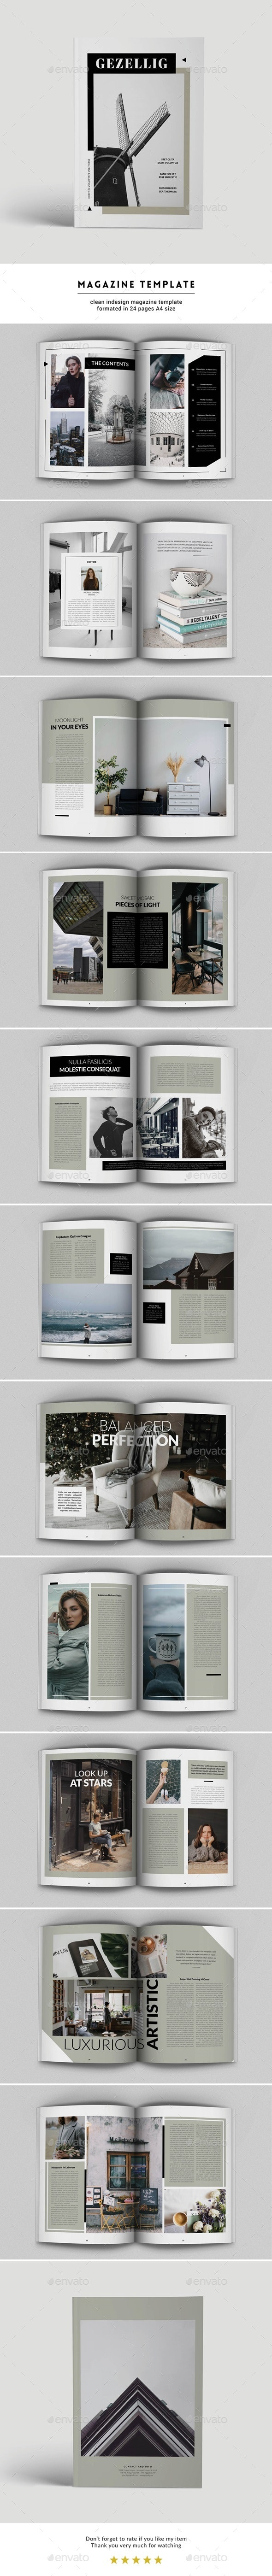 Magazine Template 02 - Magazines Print Templates